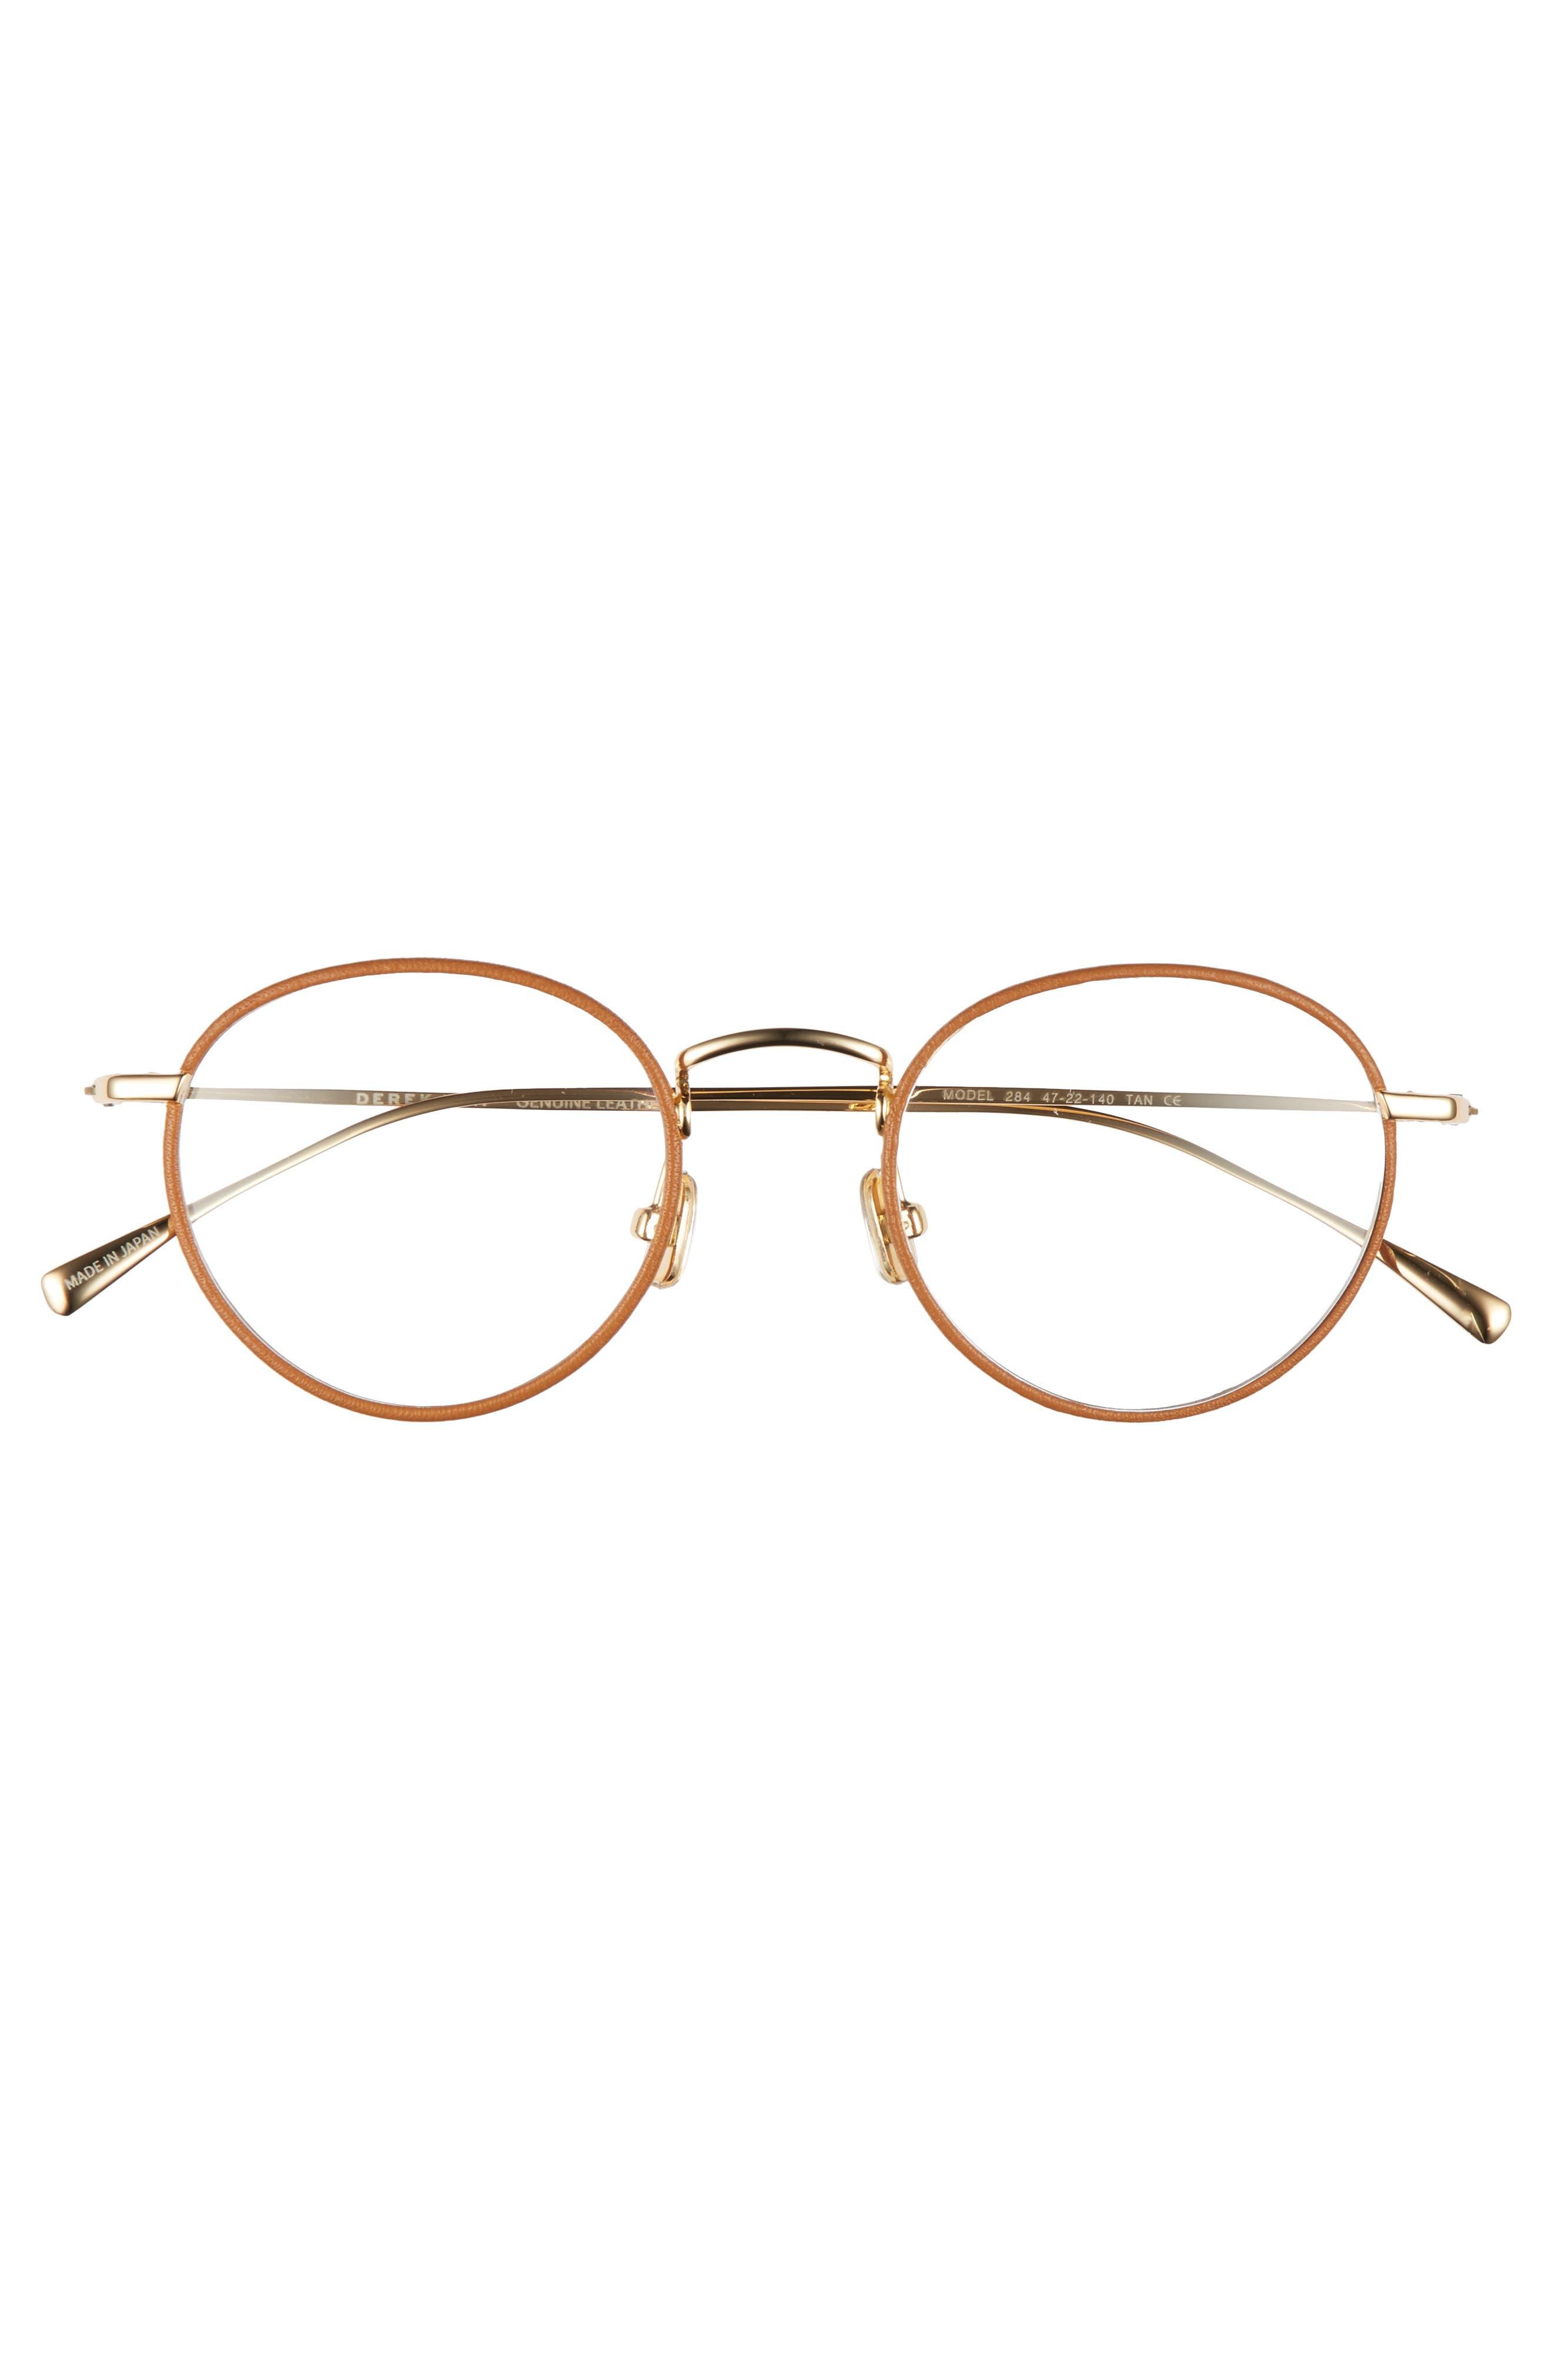 47mm Optical Glasses,                             Alternate thumbnail 3, color,                             Tan